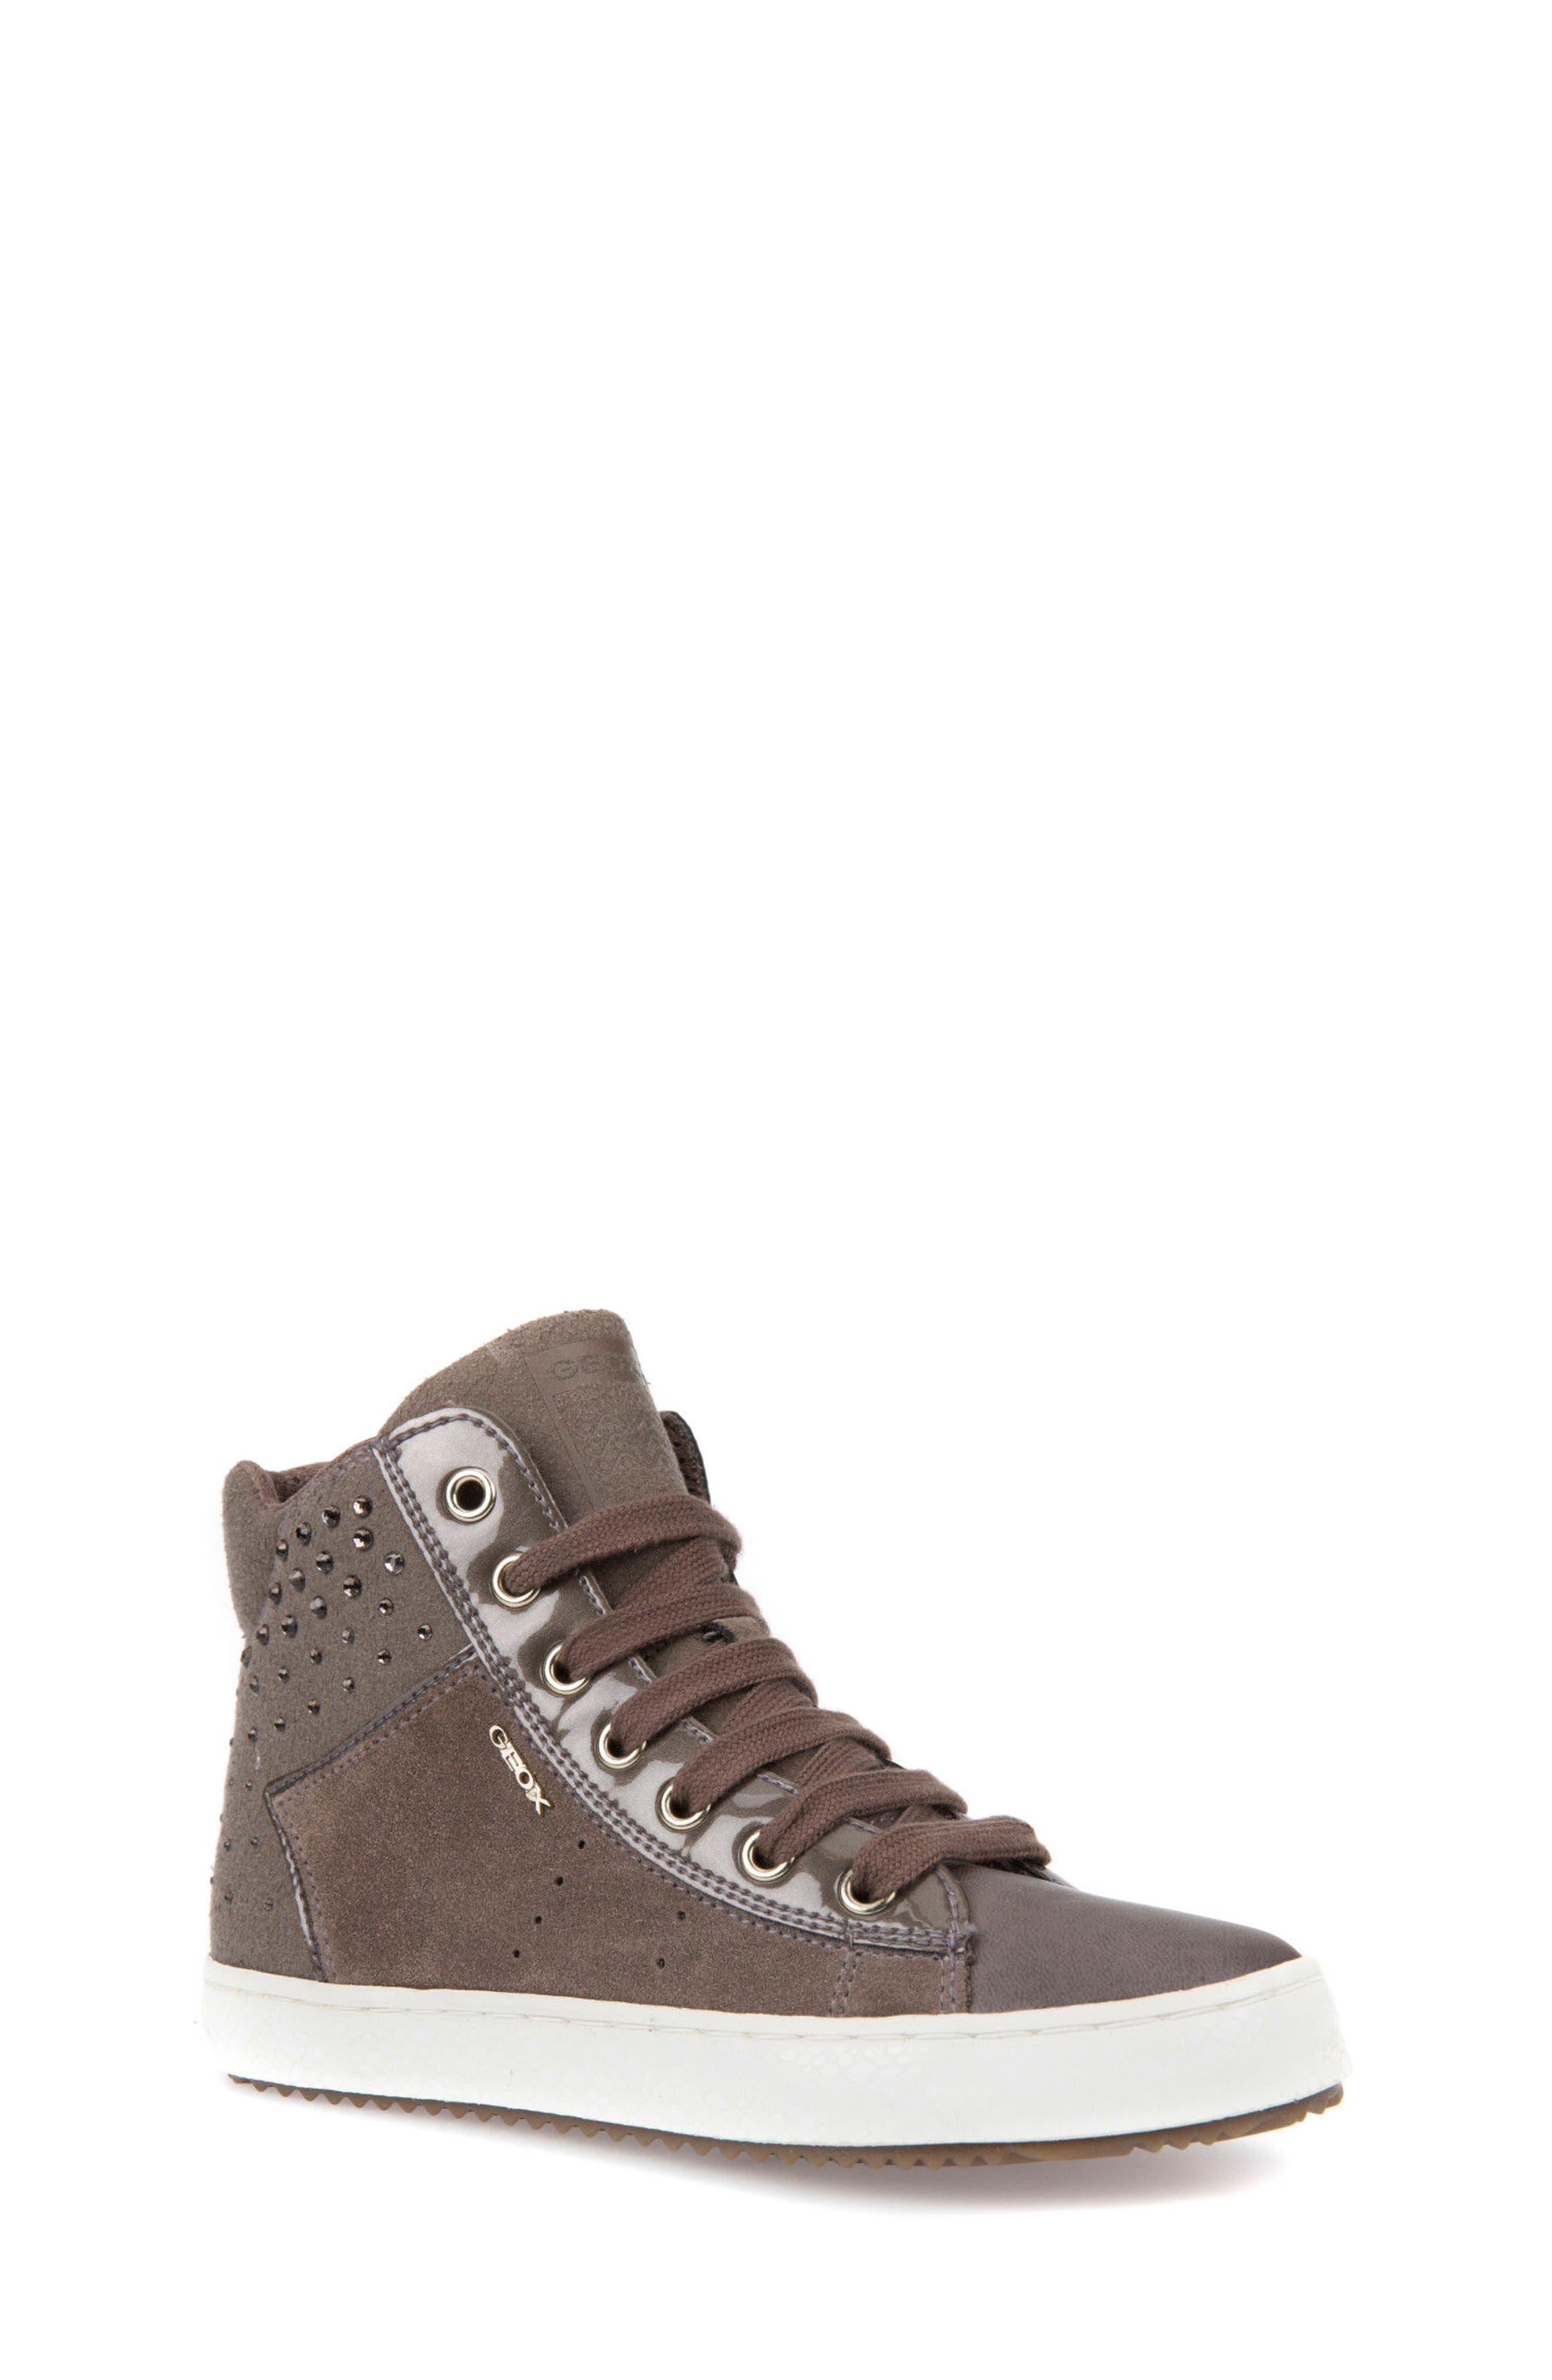 Kalispera Girl Embellished High Top Sneaker,                         Main,                         color, Dark Beige